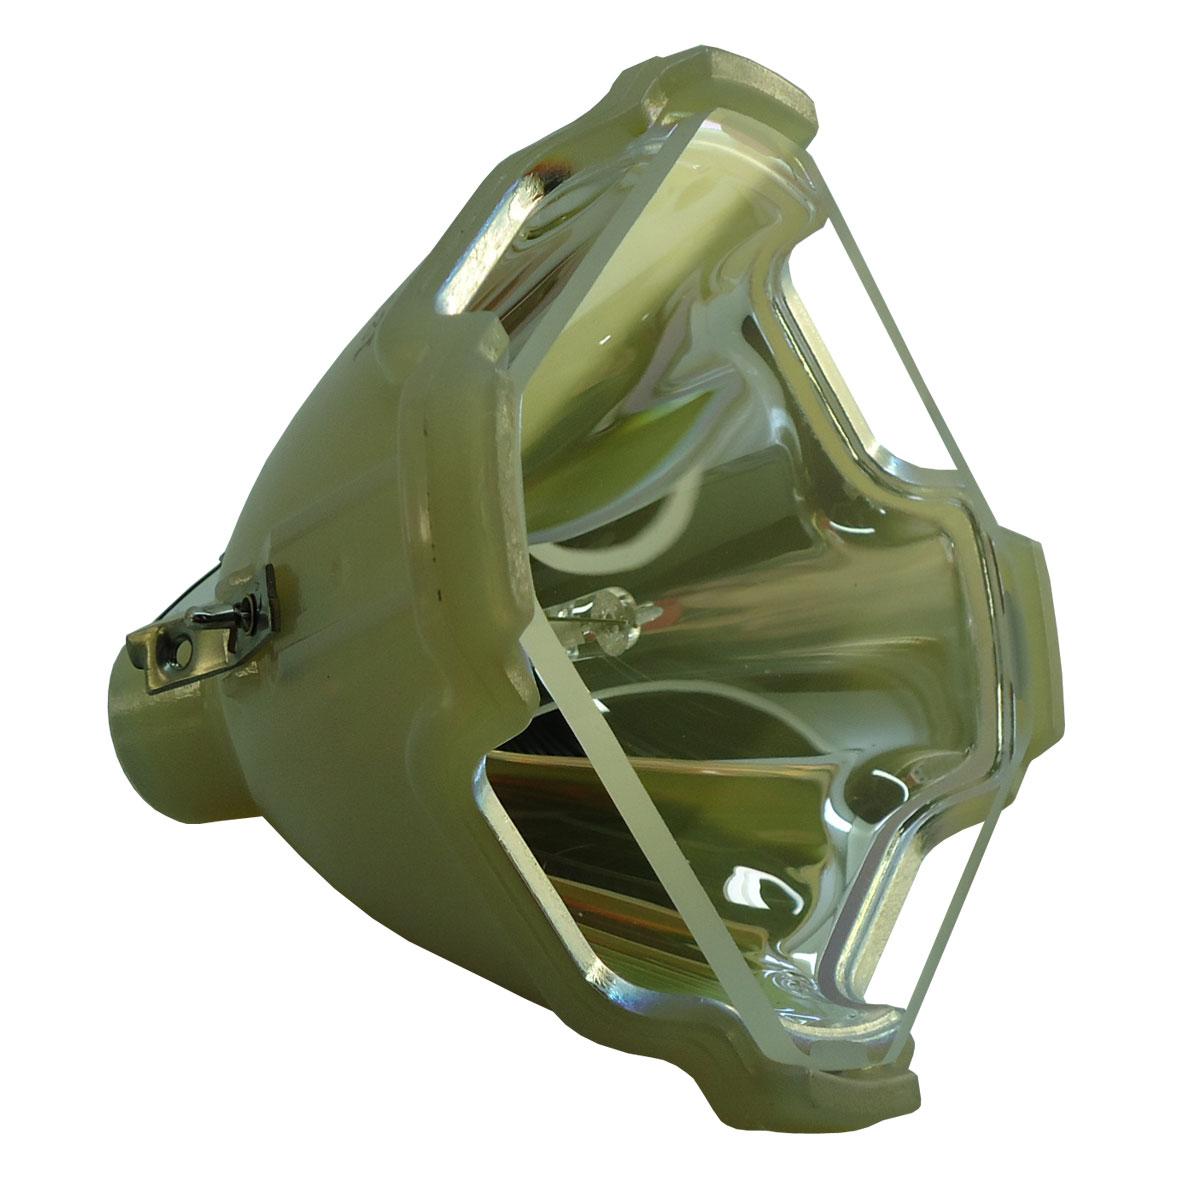 Lutema Platinum Bulb for Christie LS+58 Projector Lamp (Original Philips Inside) - image 3 de 5